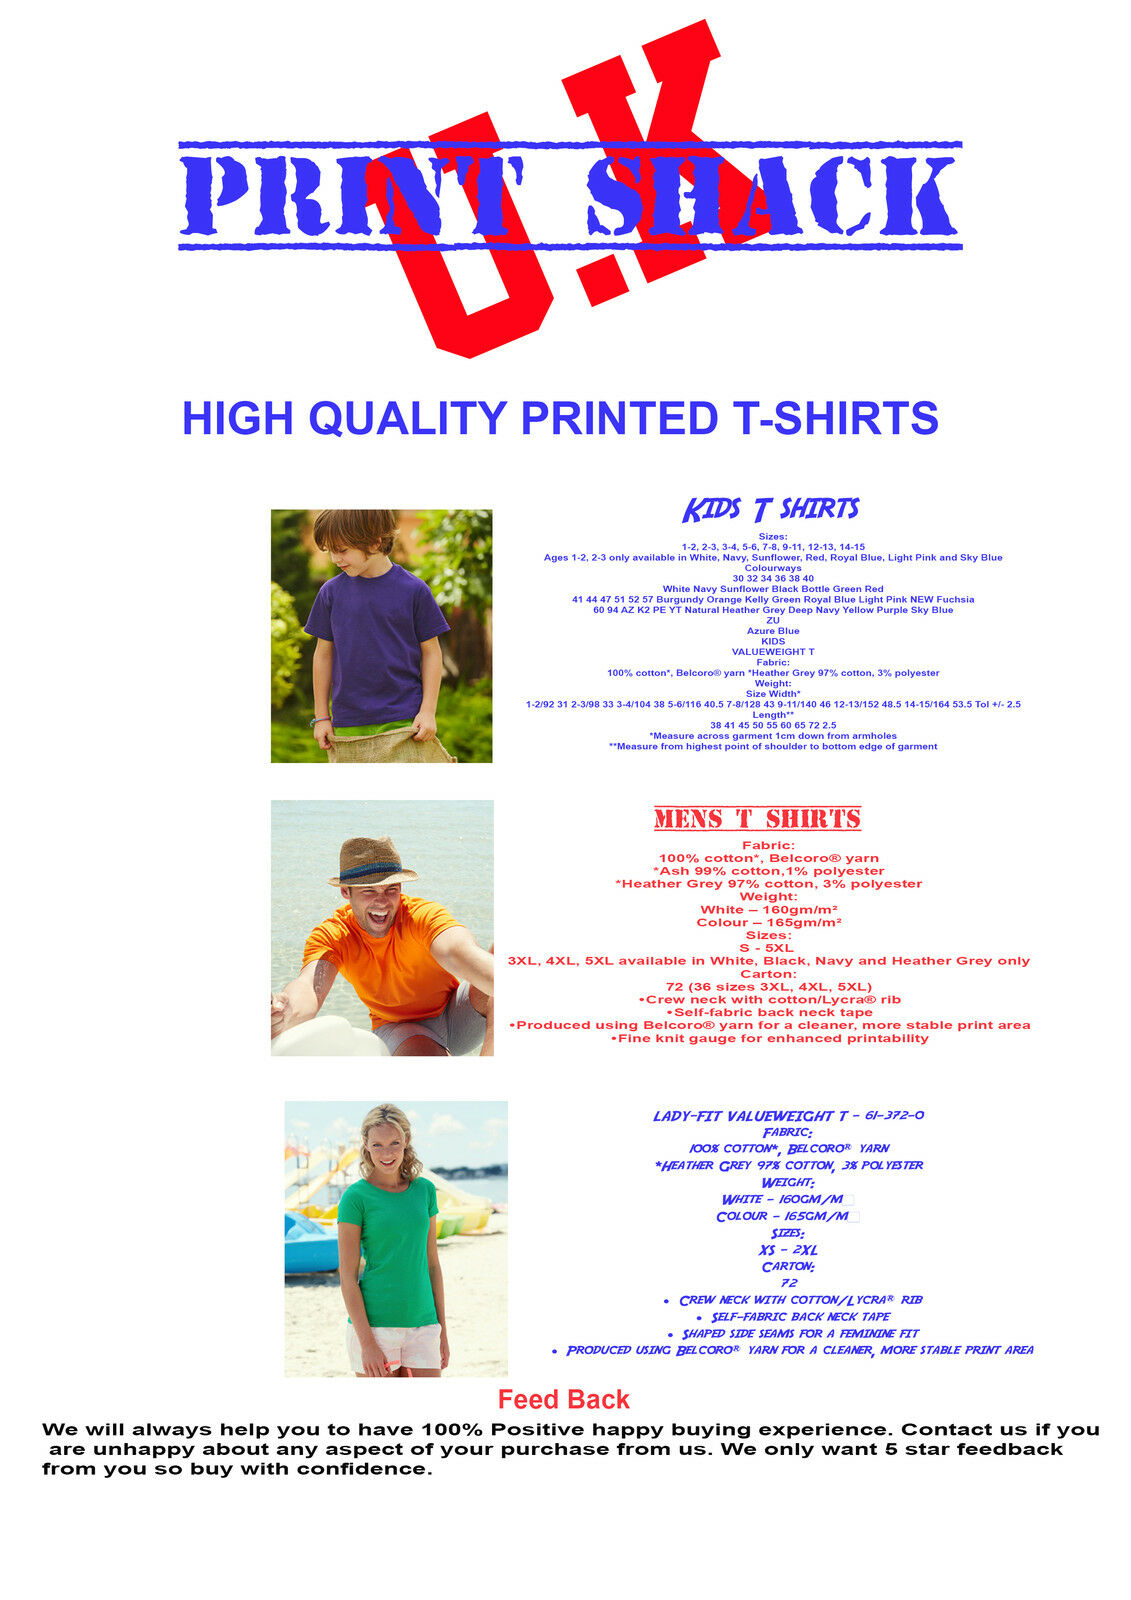 U.k Print shack